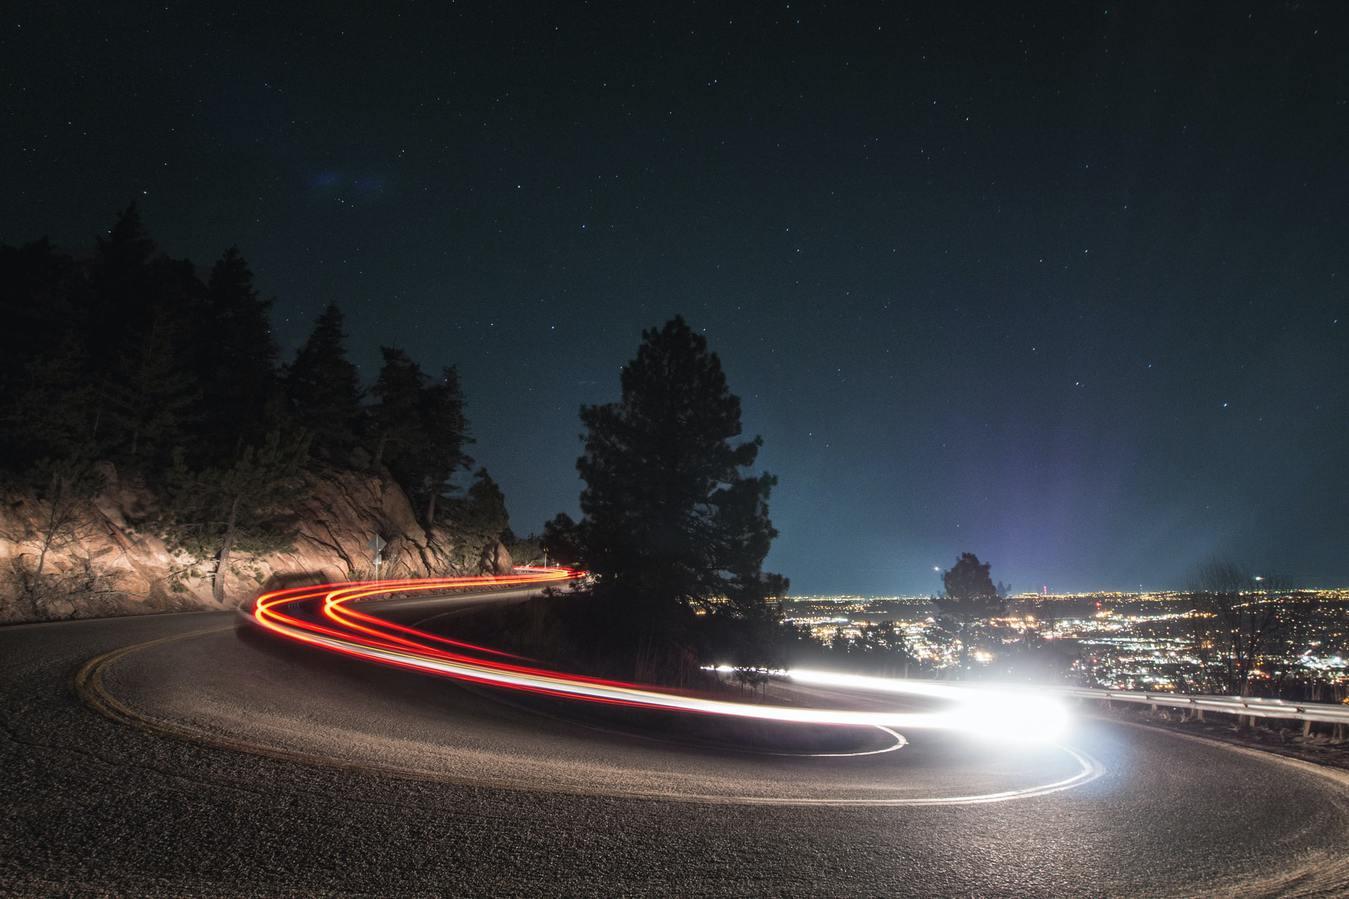 Luzes de farol na estrada